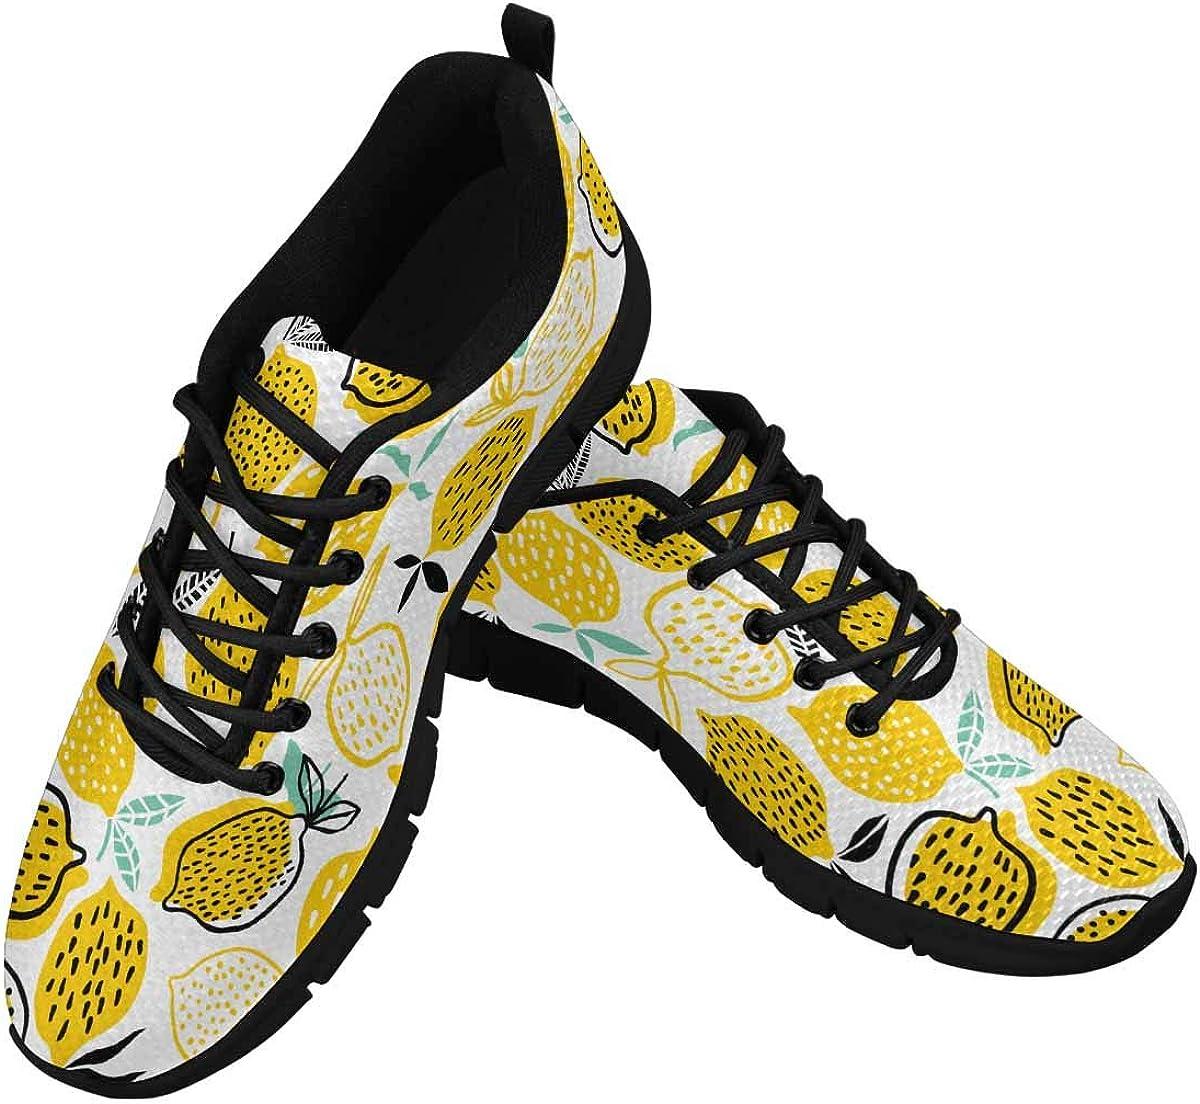 INTERESTPRINT Summer Lemon Pattern Women's Athletic Walking Shoes Breathe Comfort Mesh